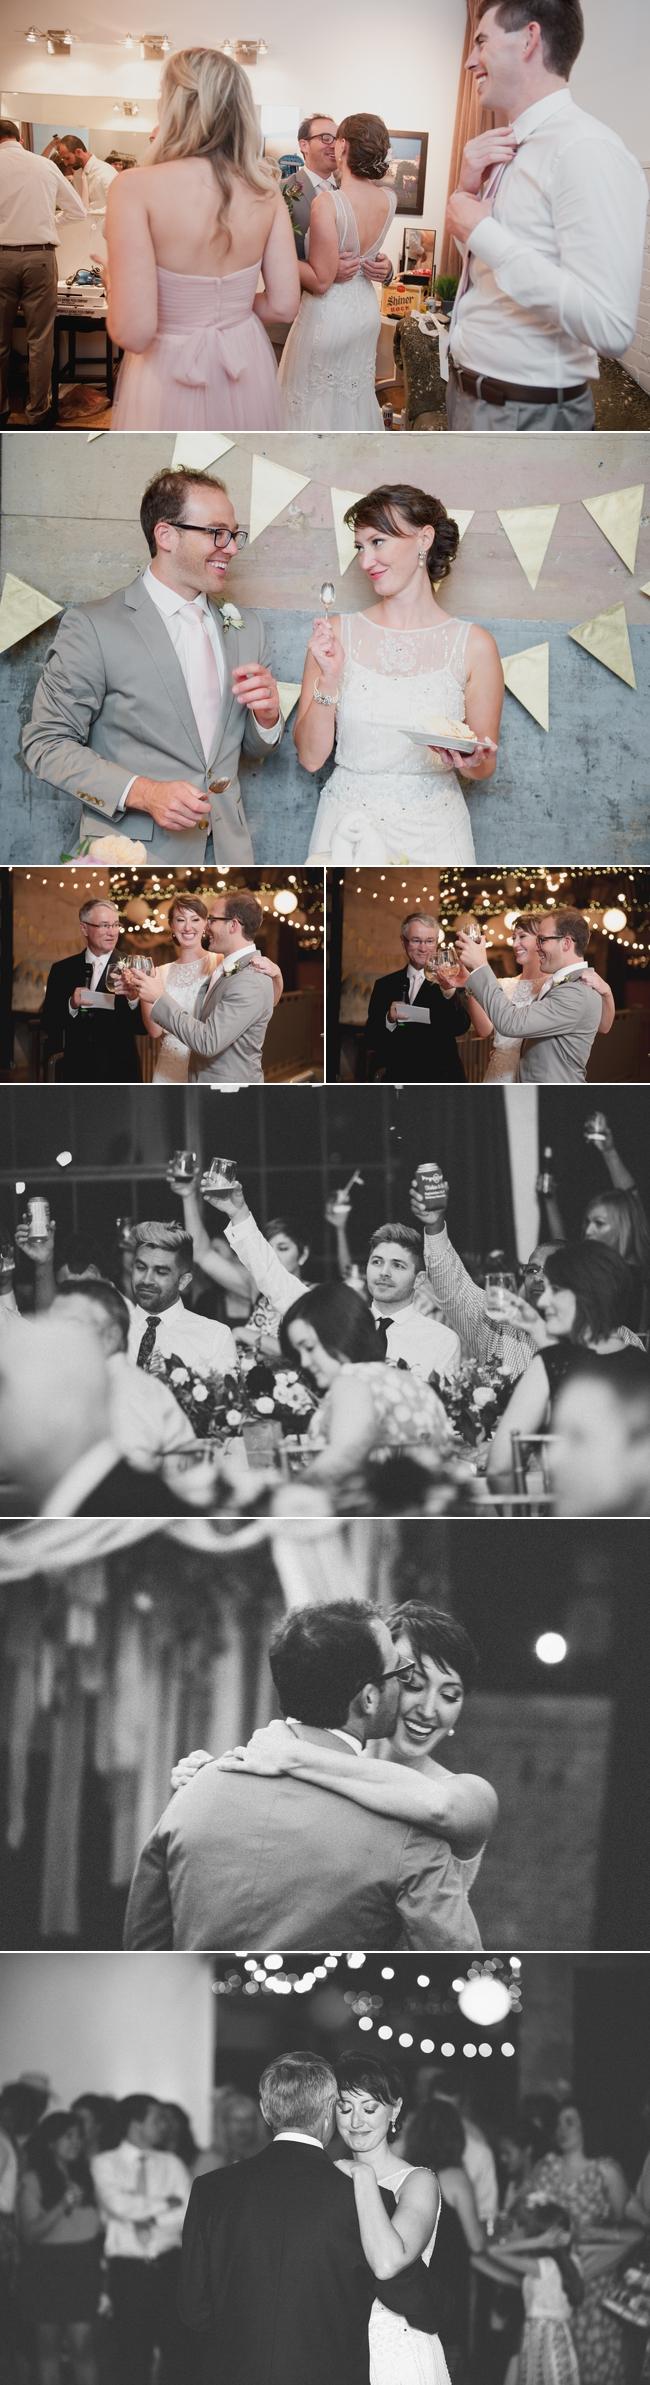 Dallas Best Wedding Photographers